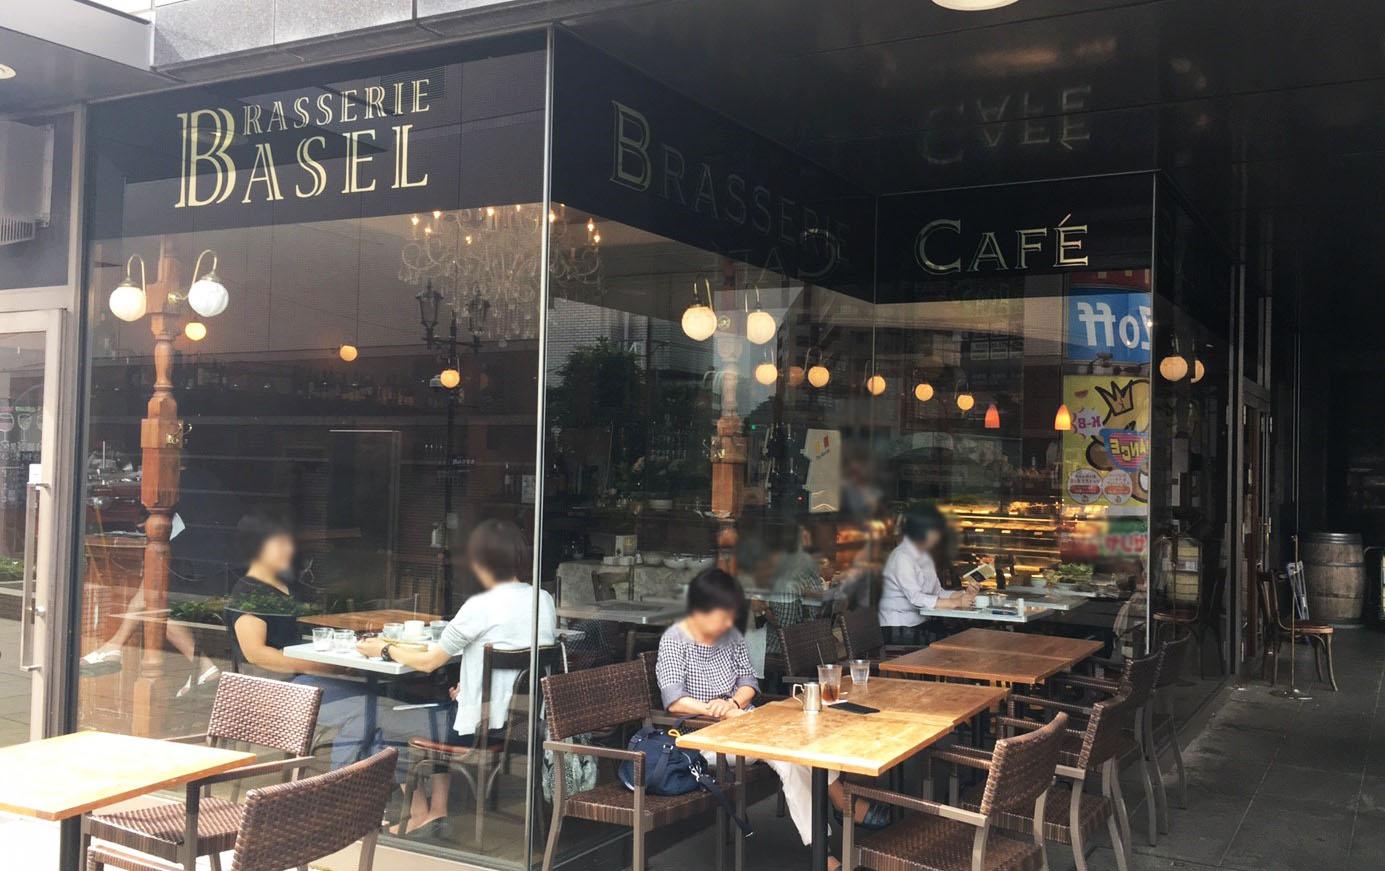 BASEL(バーゼル)602円モーニングのパンが超絶美味しい